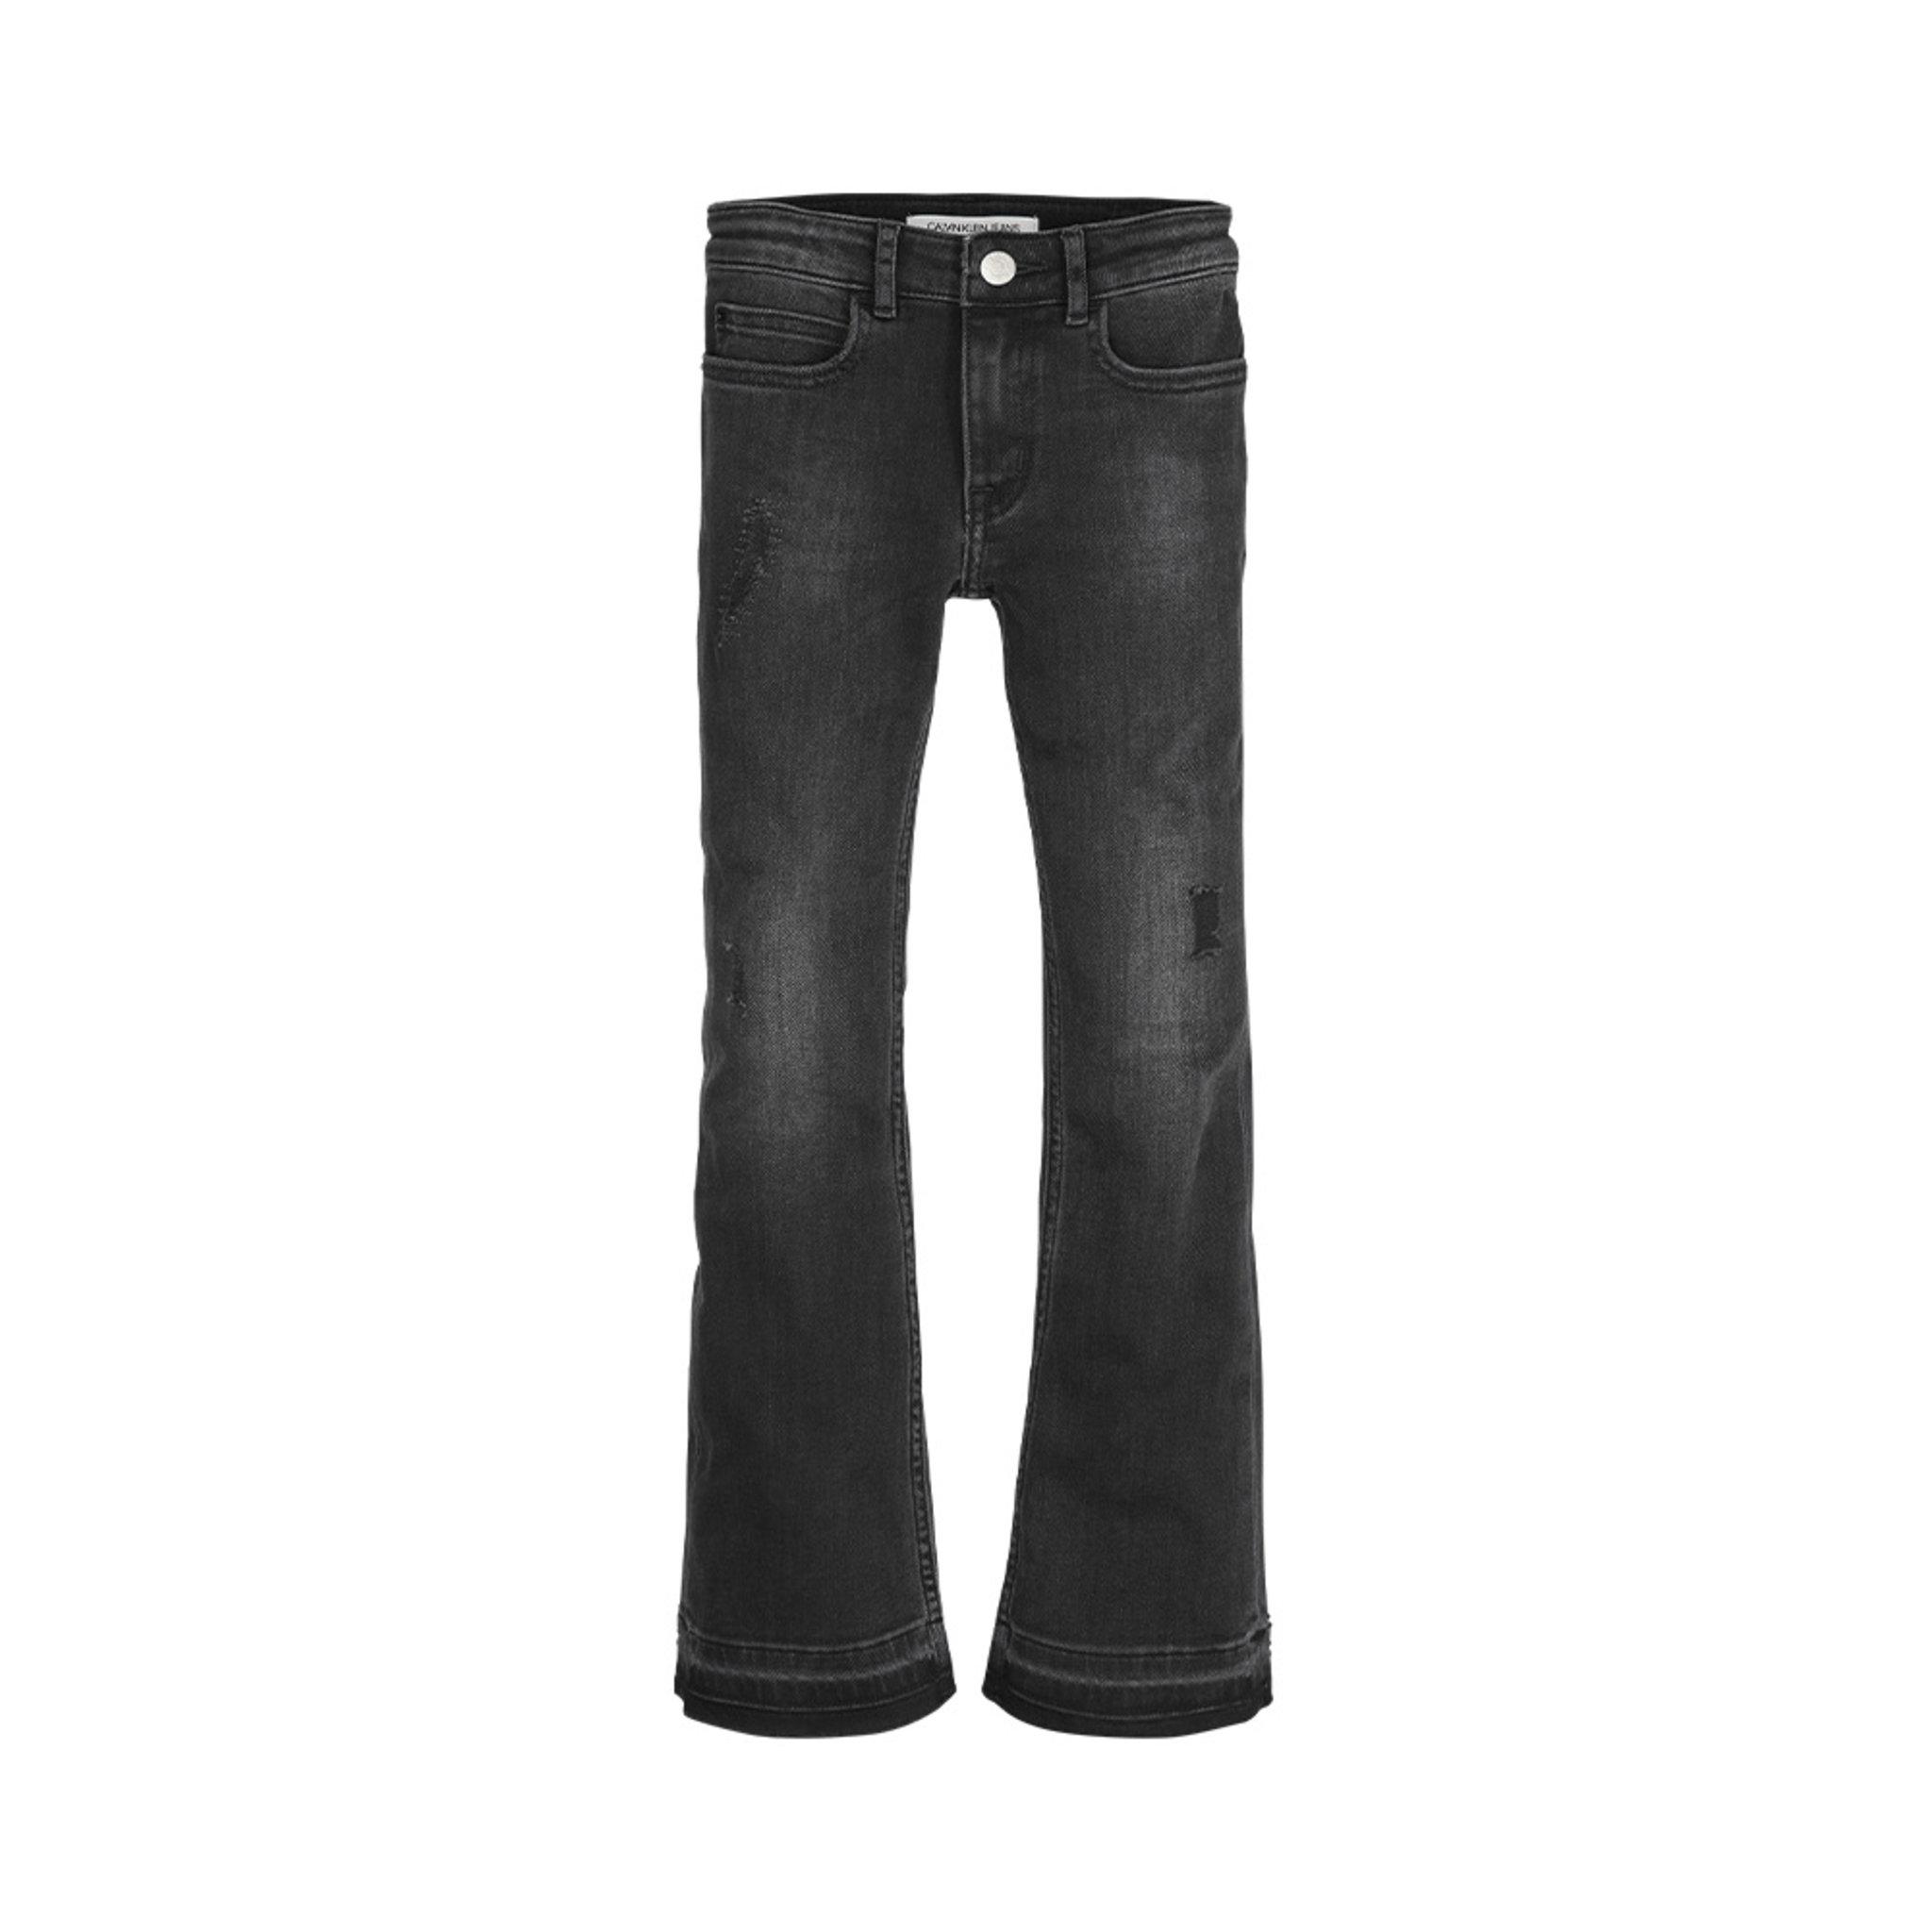 Jeans FLARE MR WORN